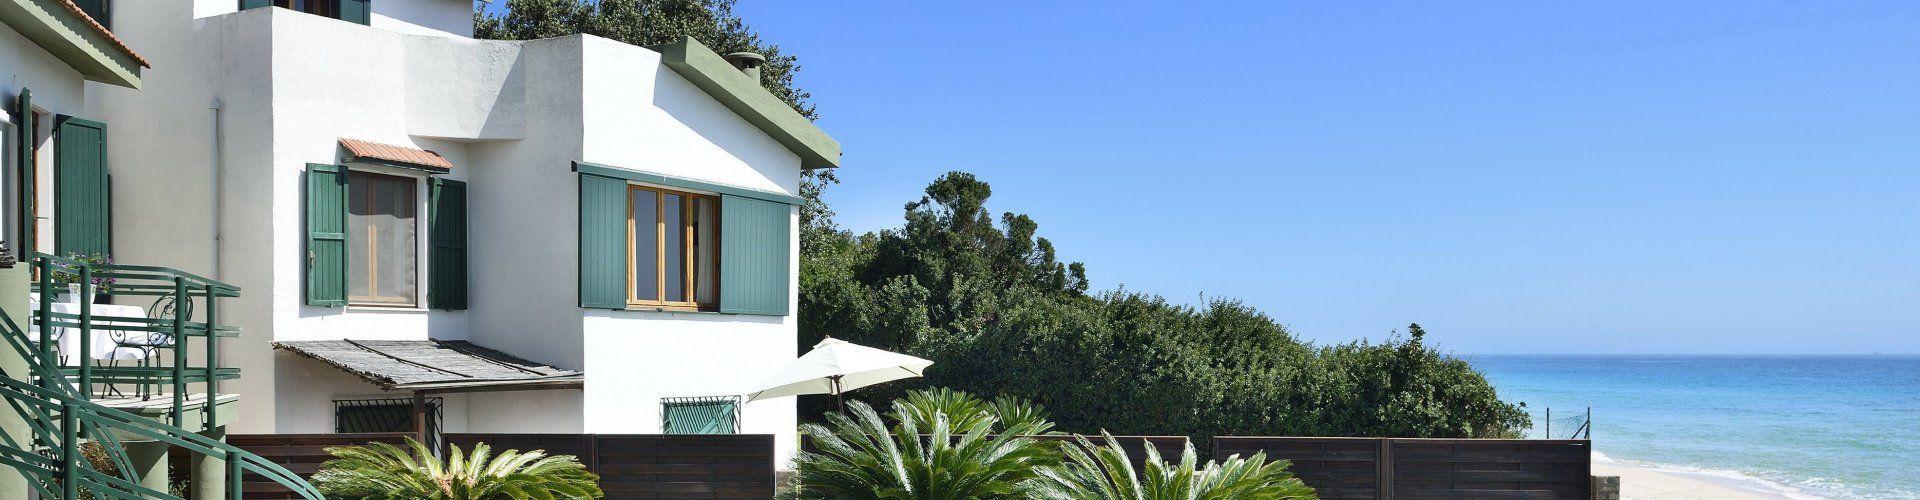 Villa mit Garten direkt am Meer